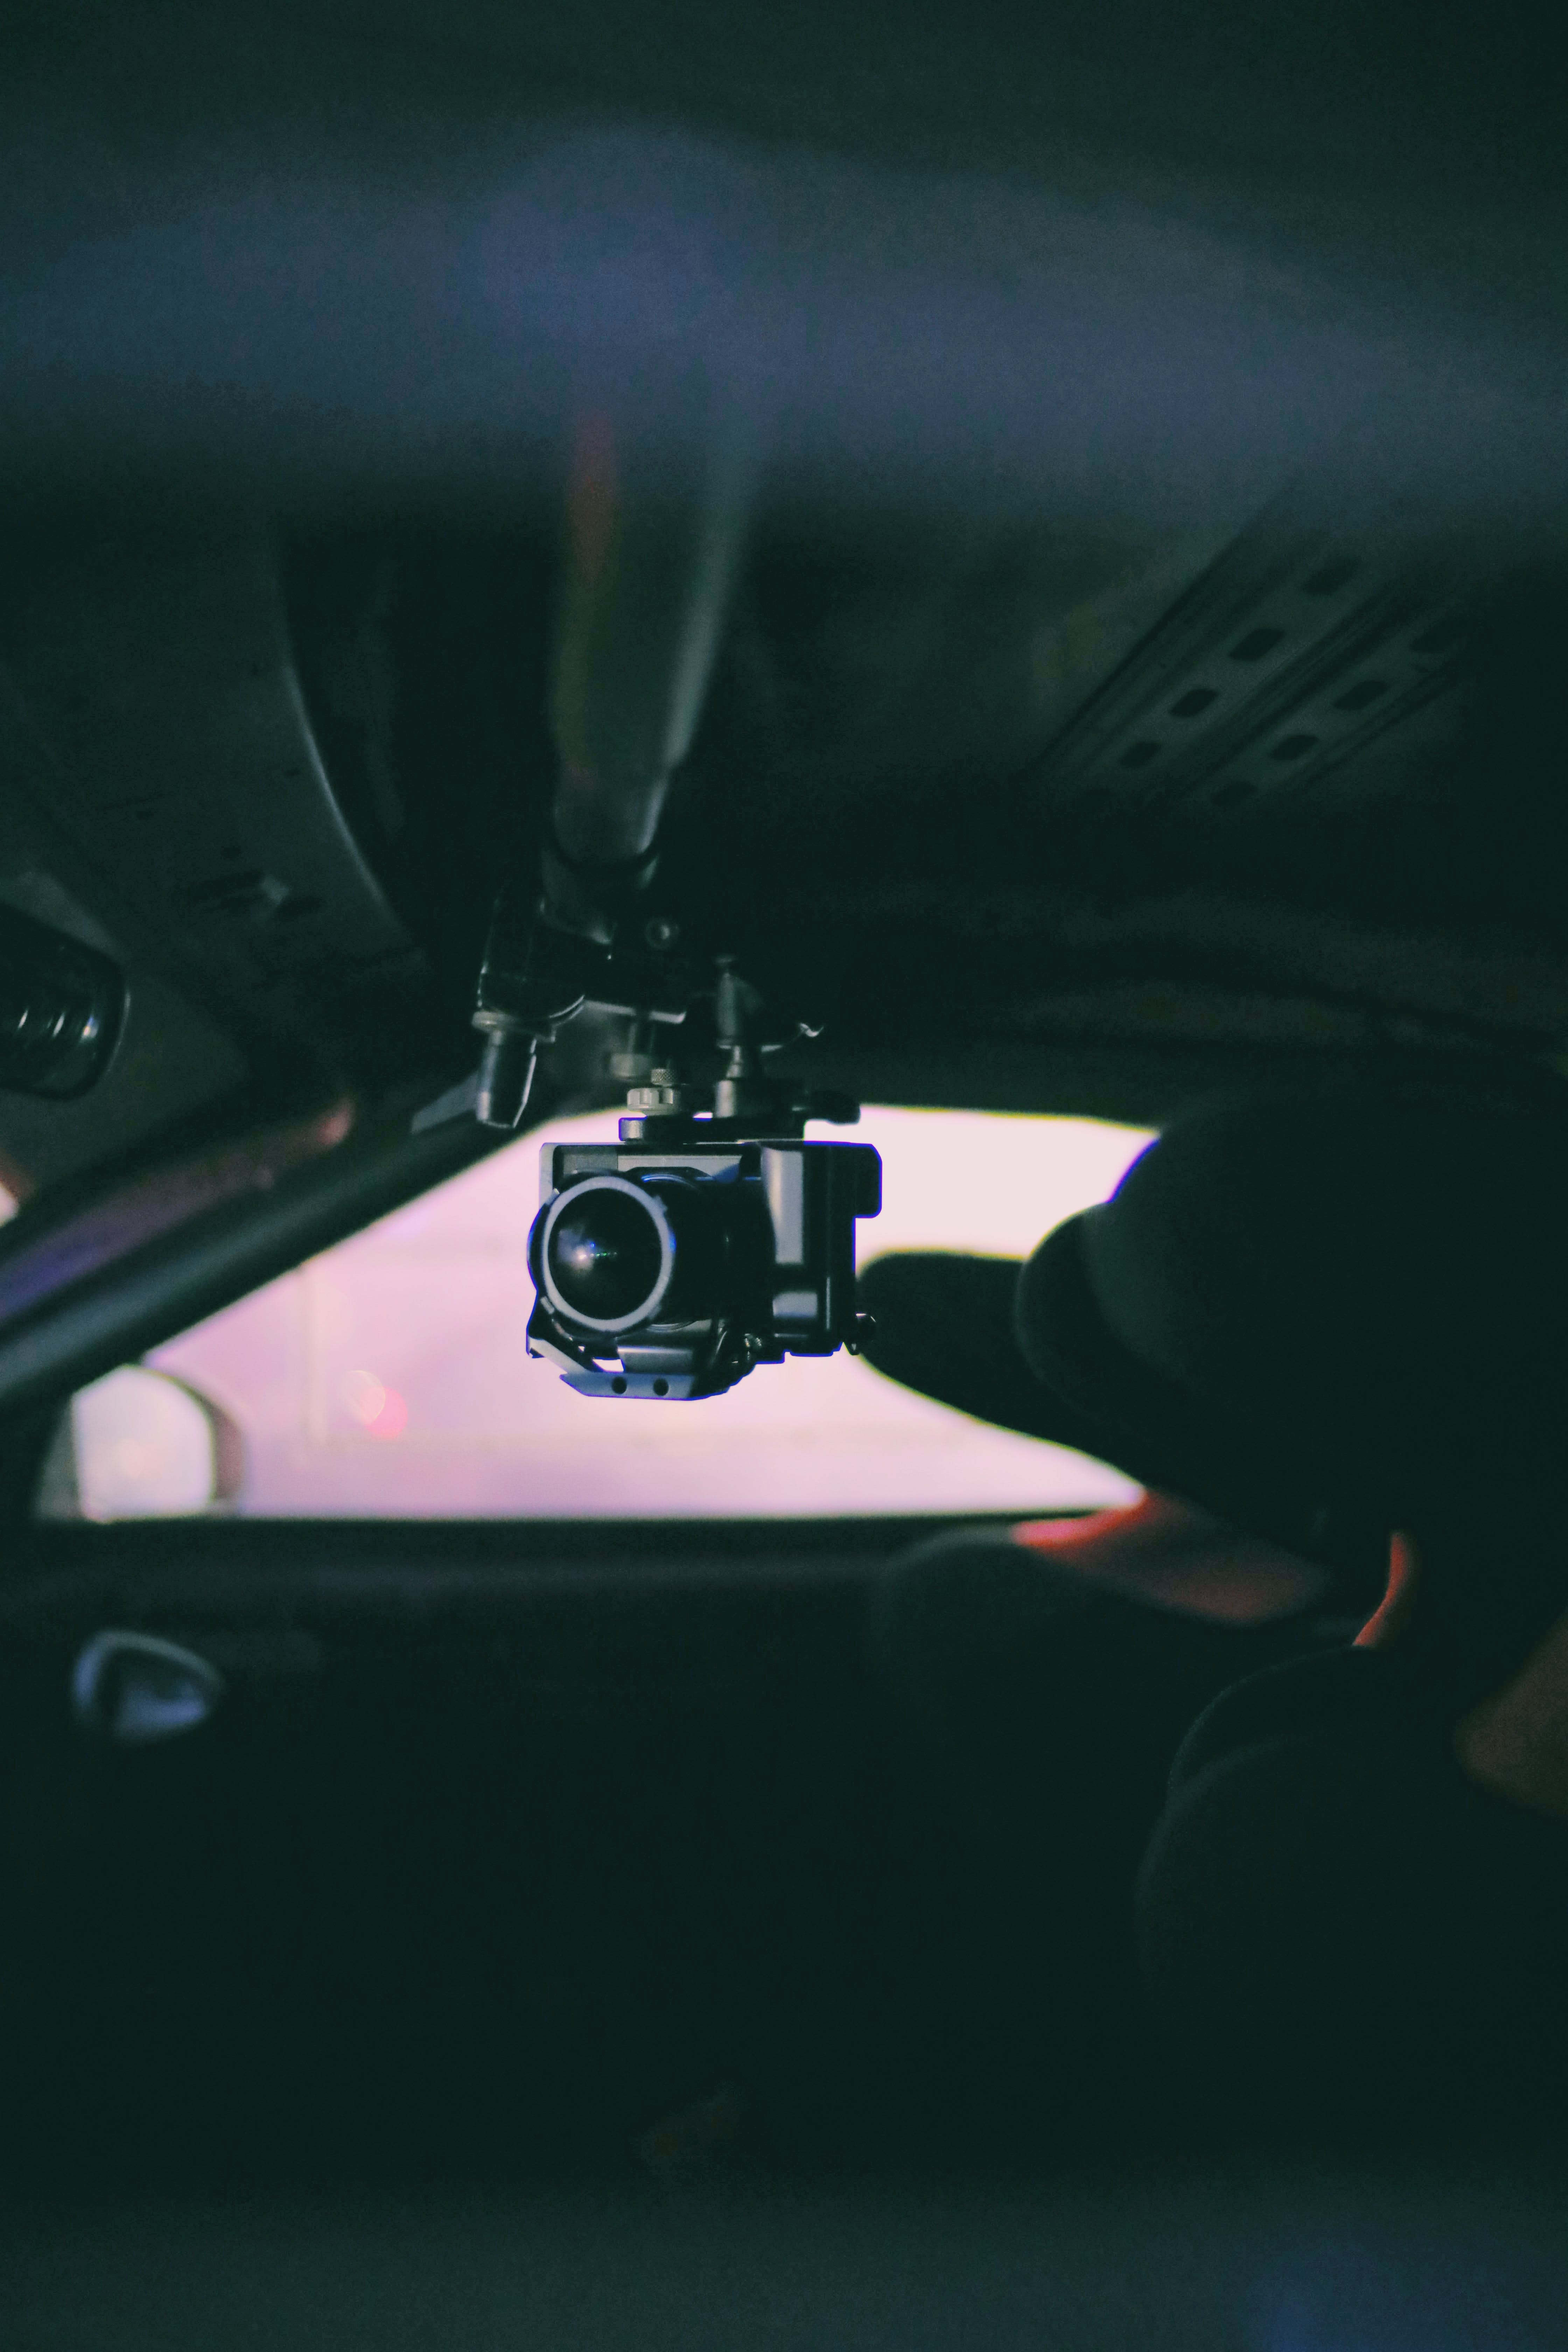 camera inside the vehicle